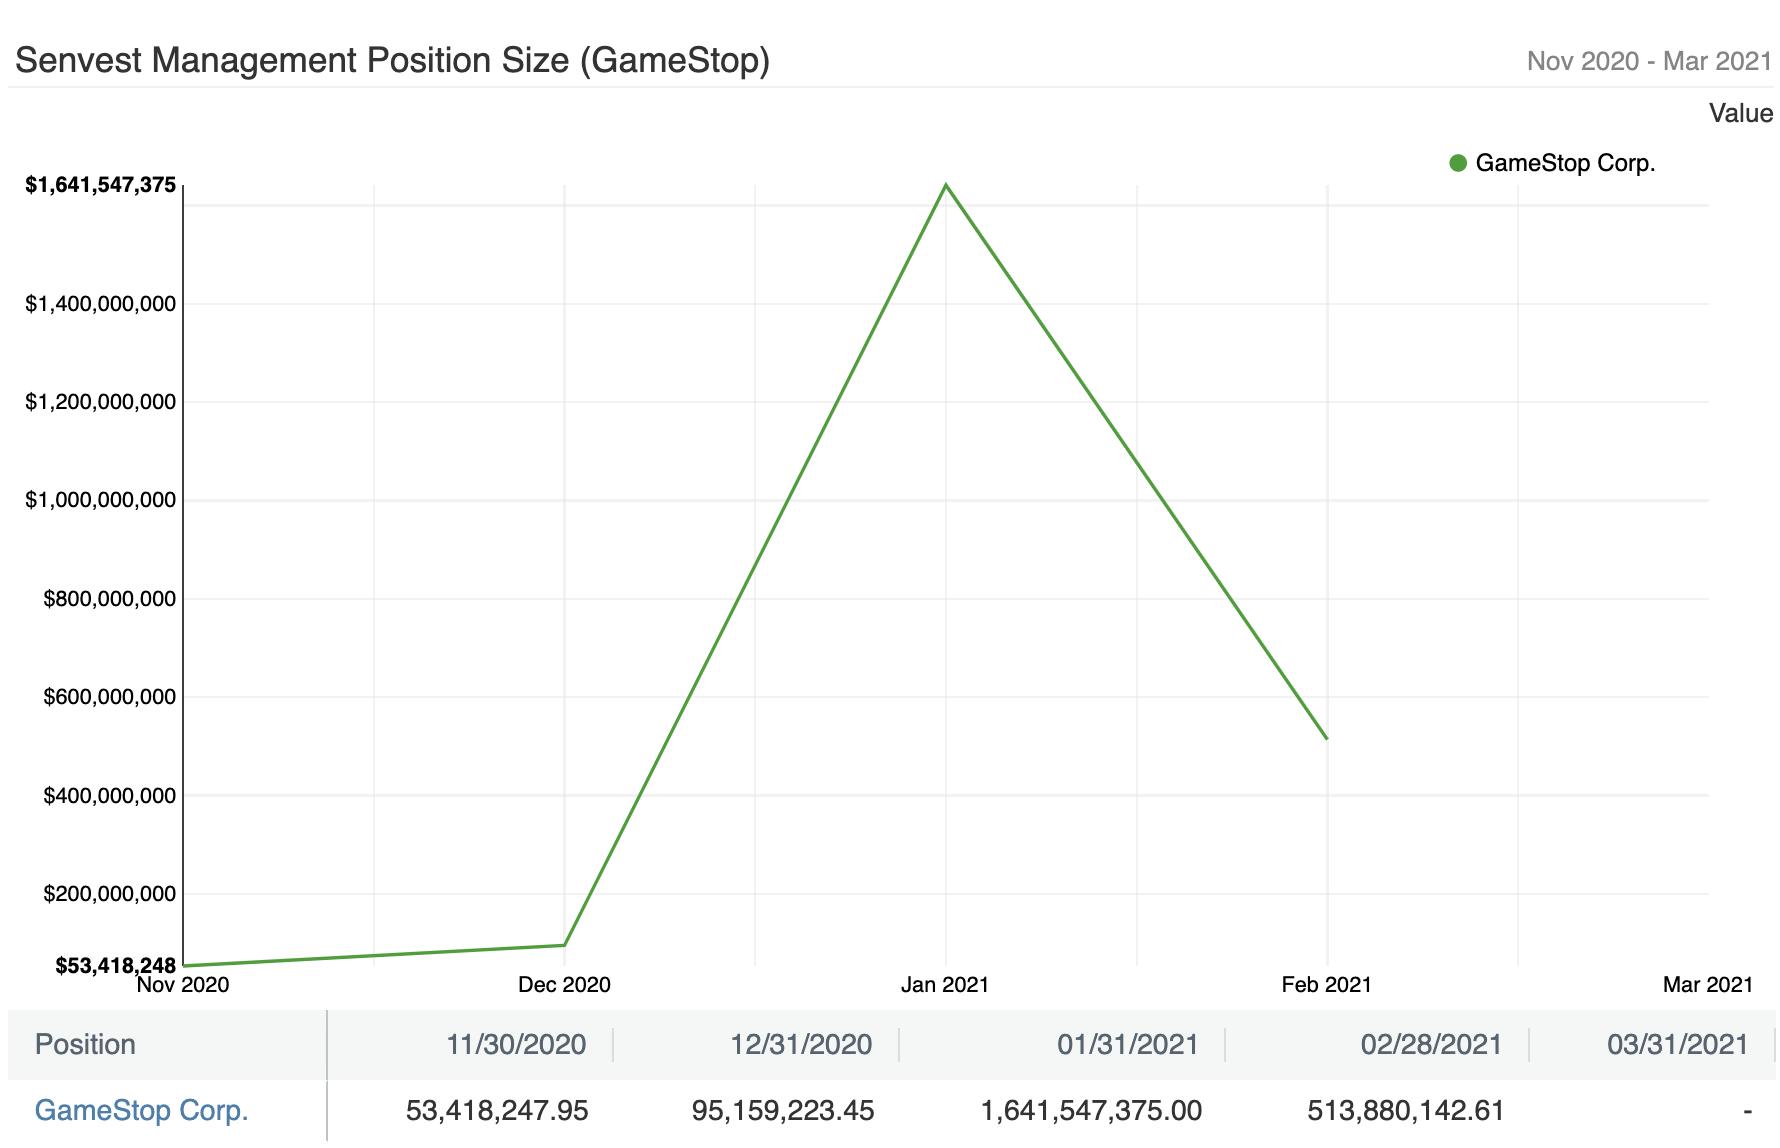 Senvest Management Position Size (GameStop)